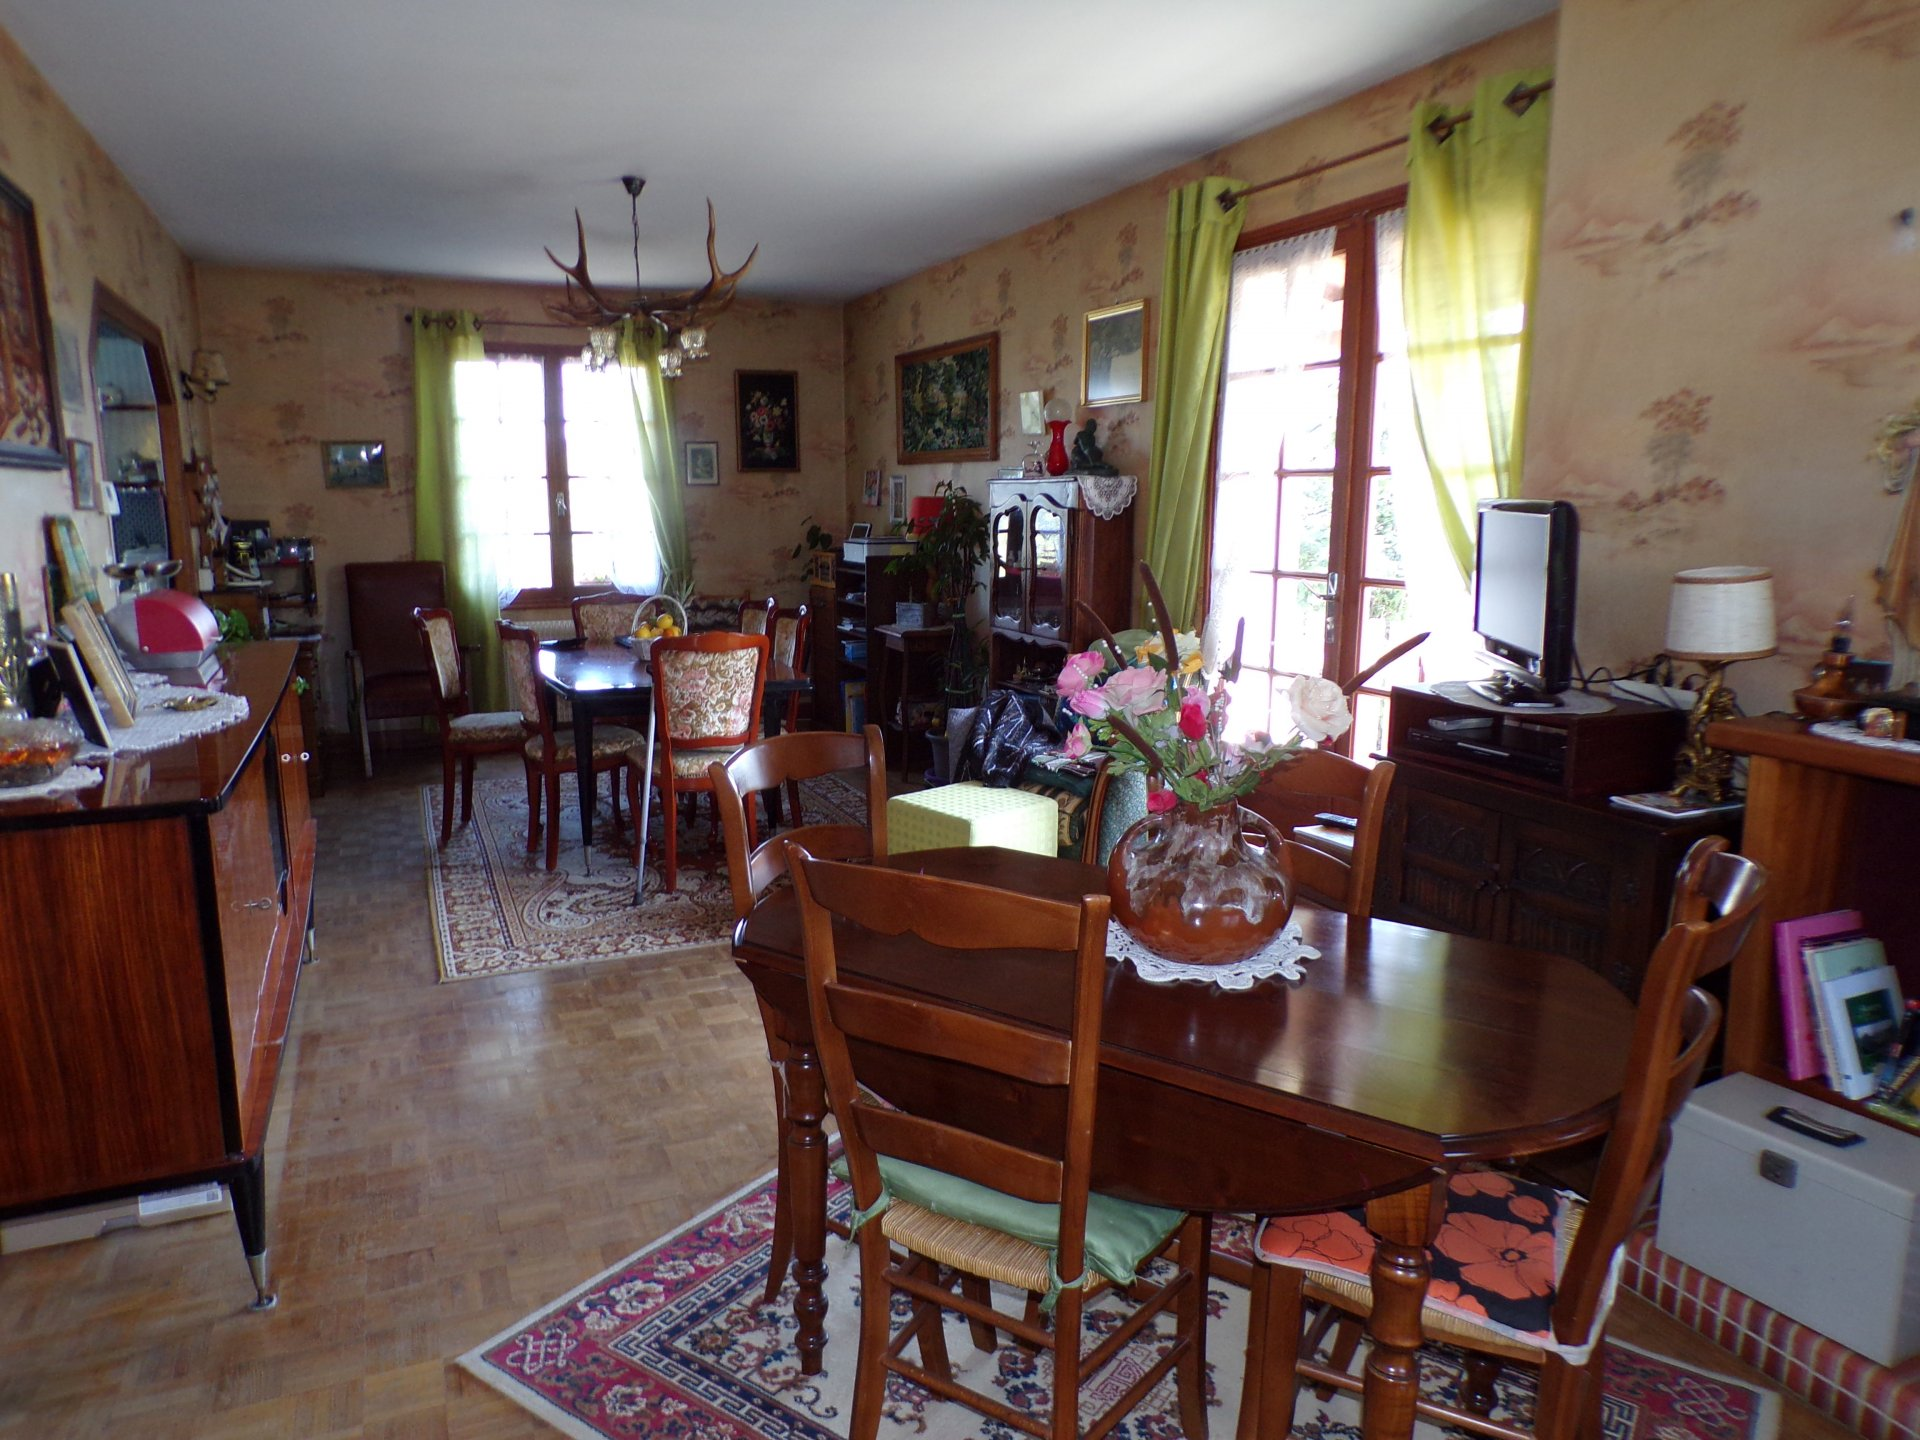 Town house in Ruffec